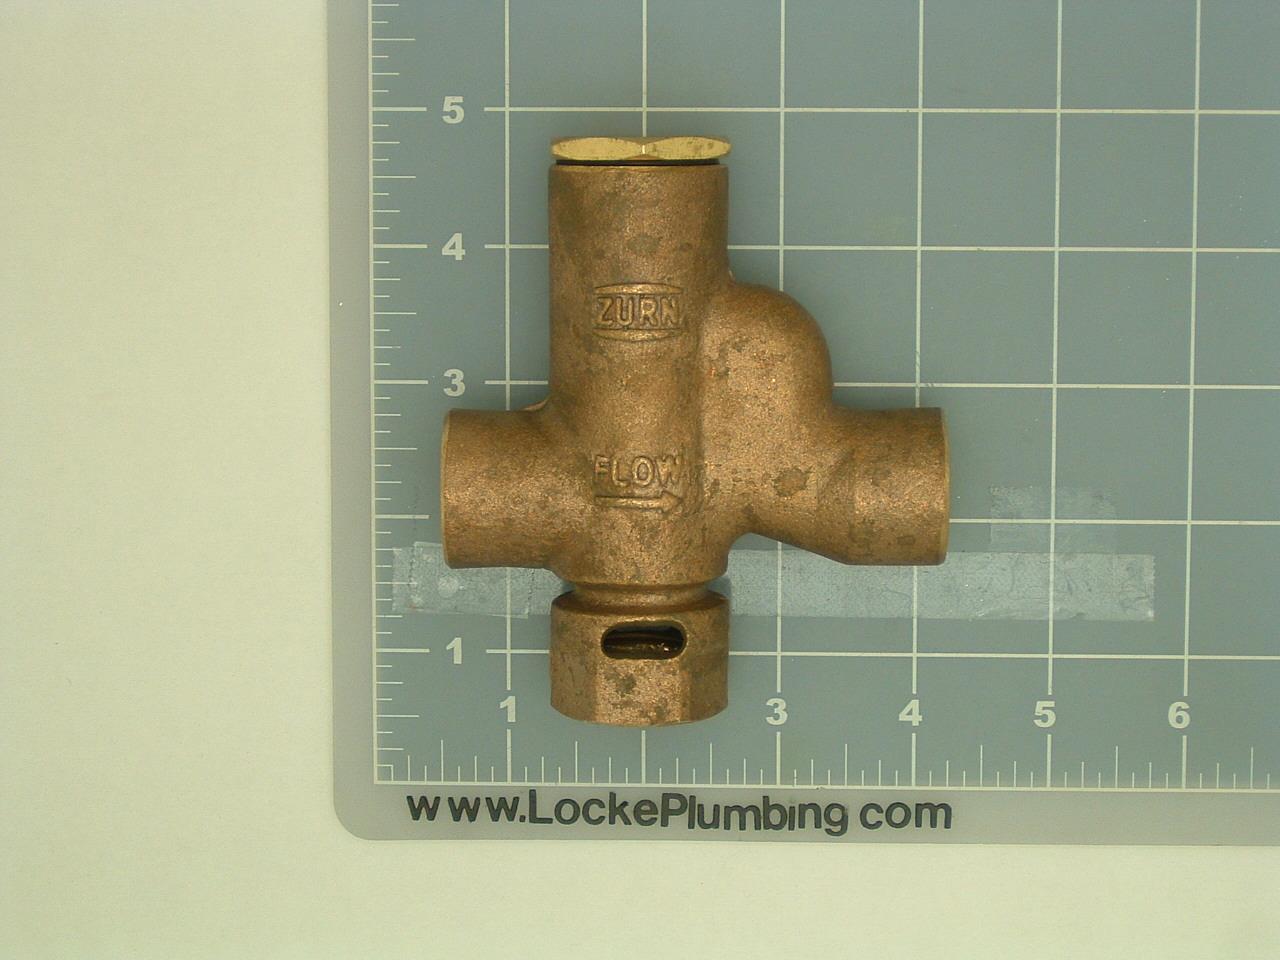 Zurn Z1022 Automatic Trap Seal Primer Locke Plumbing